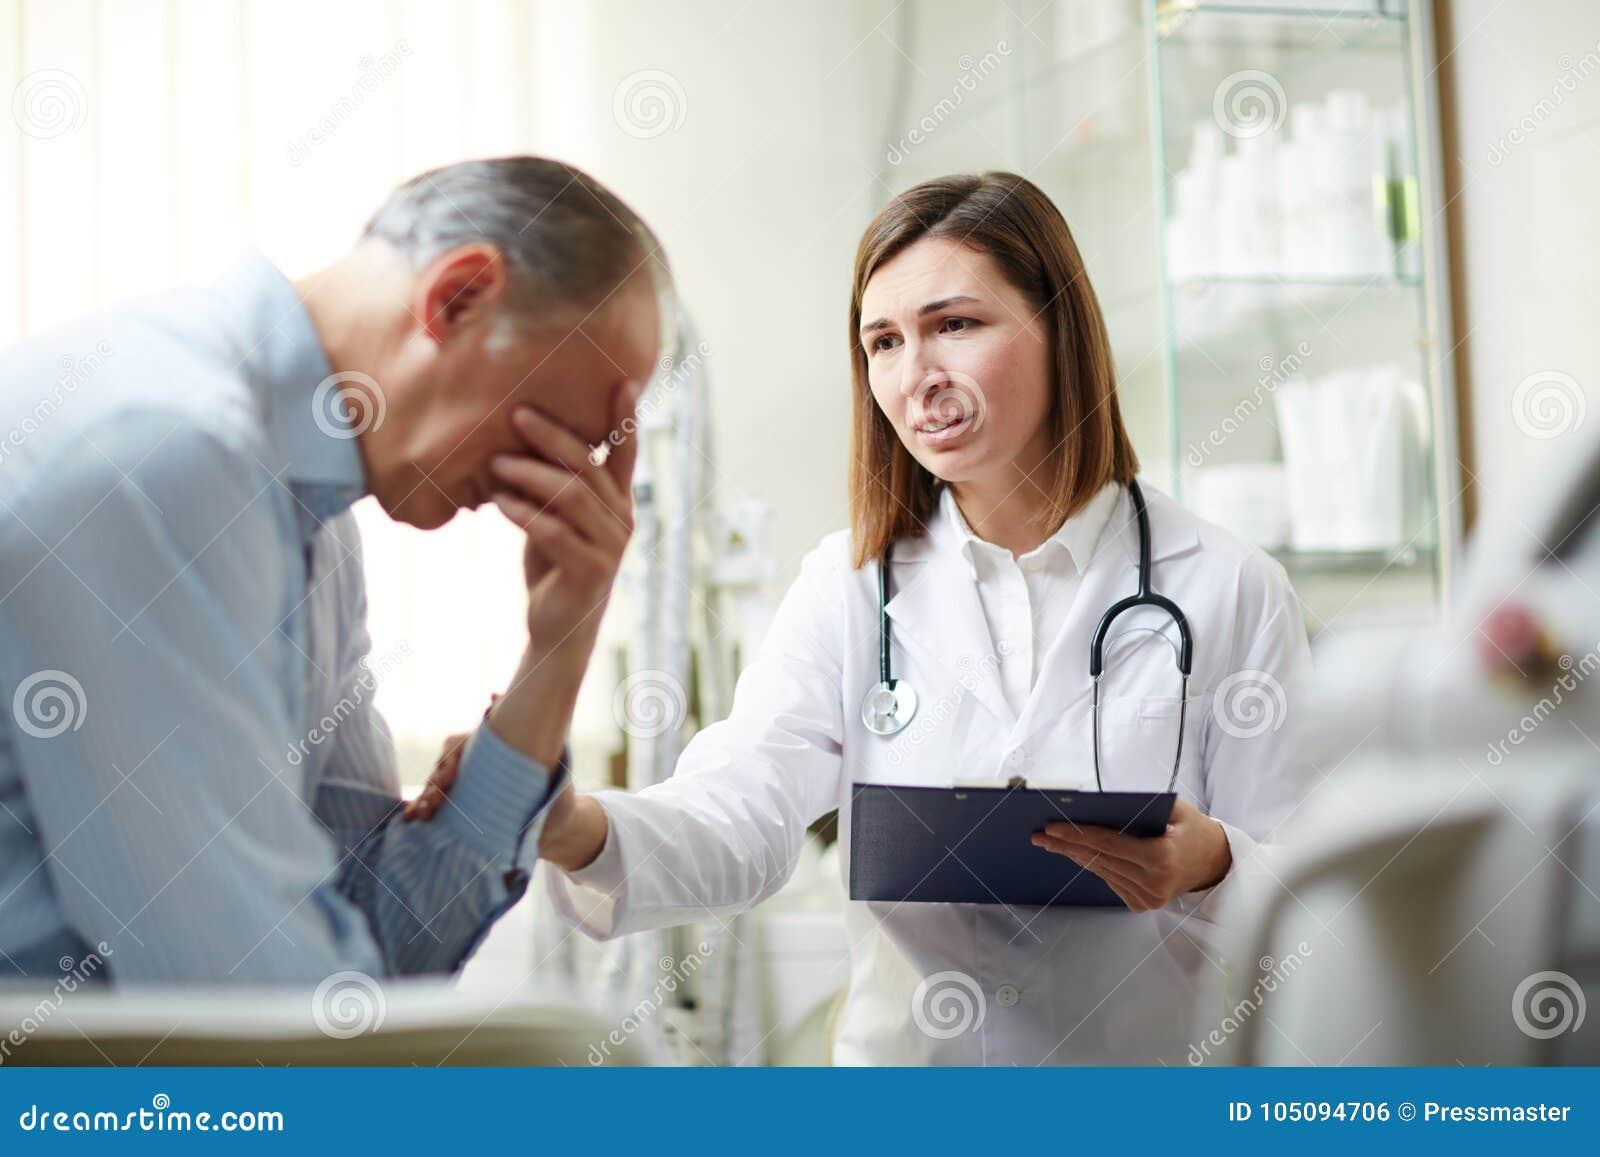 Поддержка врач-клинициста